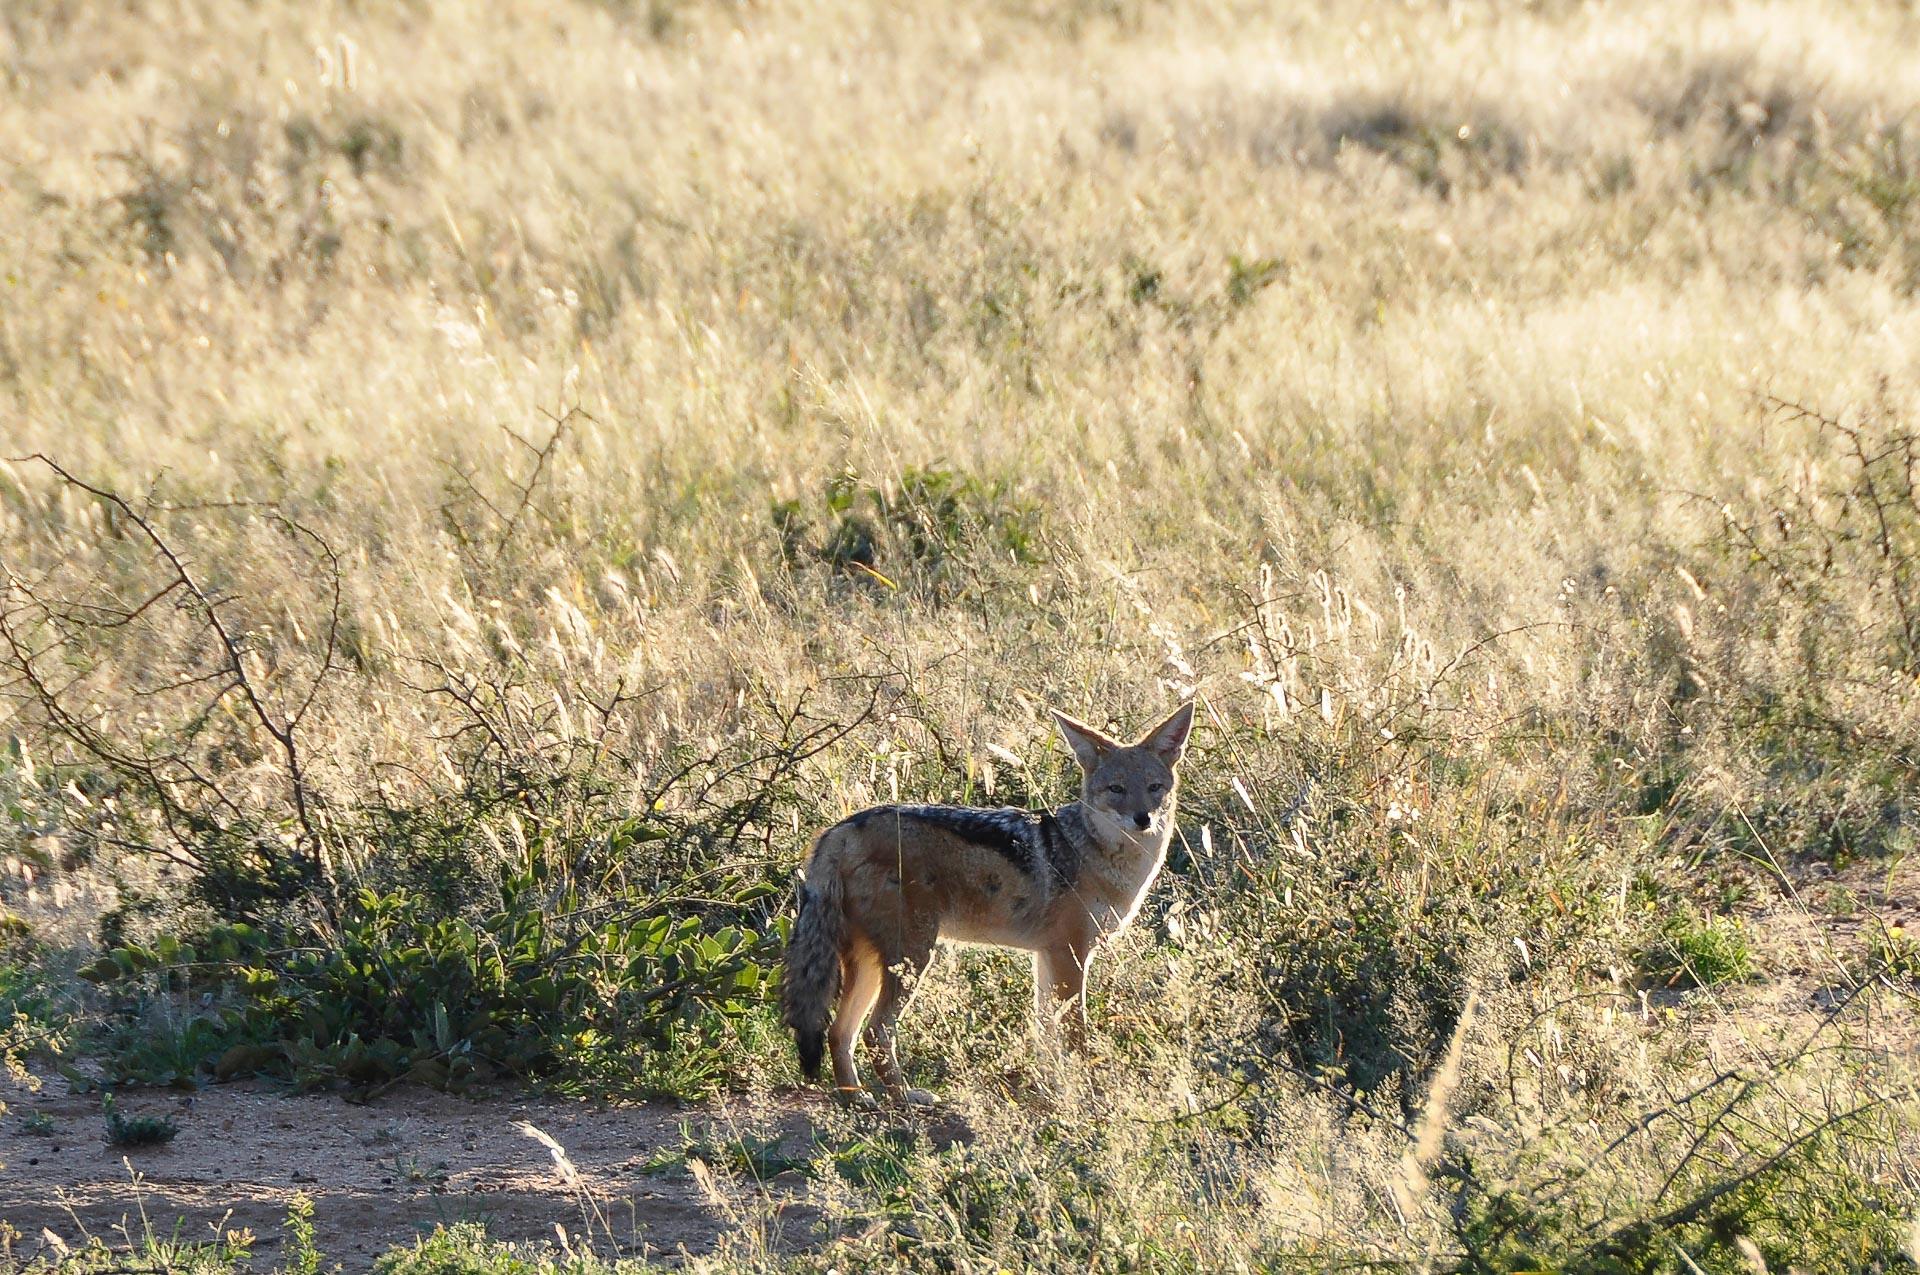 Okonjima-Namibia-Globetrotter-Select-4